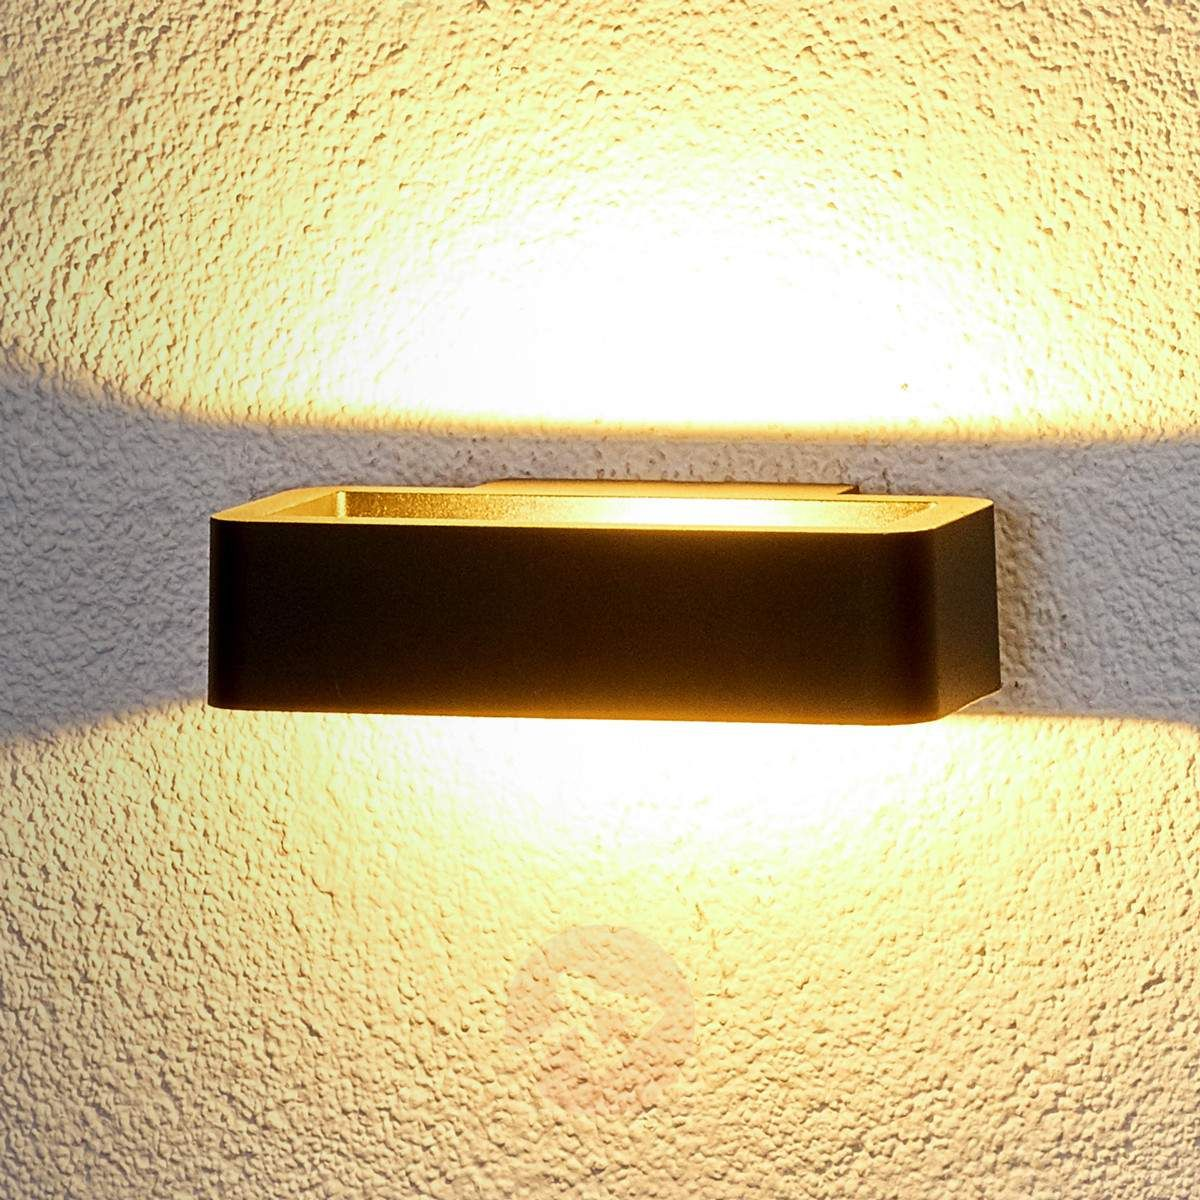 Julian LED outdoor wall light in black-9972050-30 | Lights ...